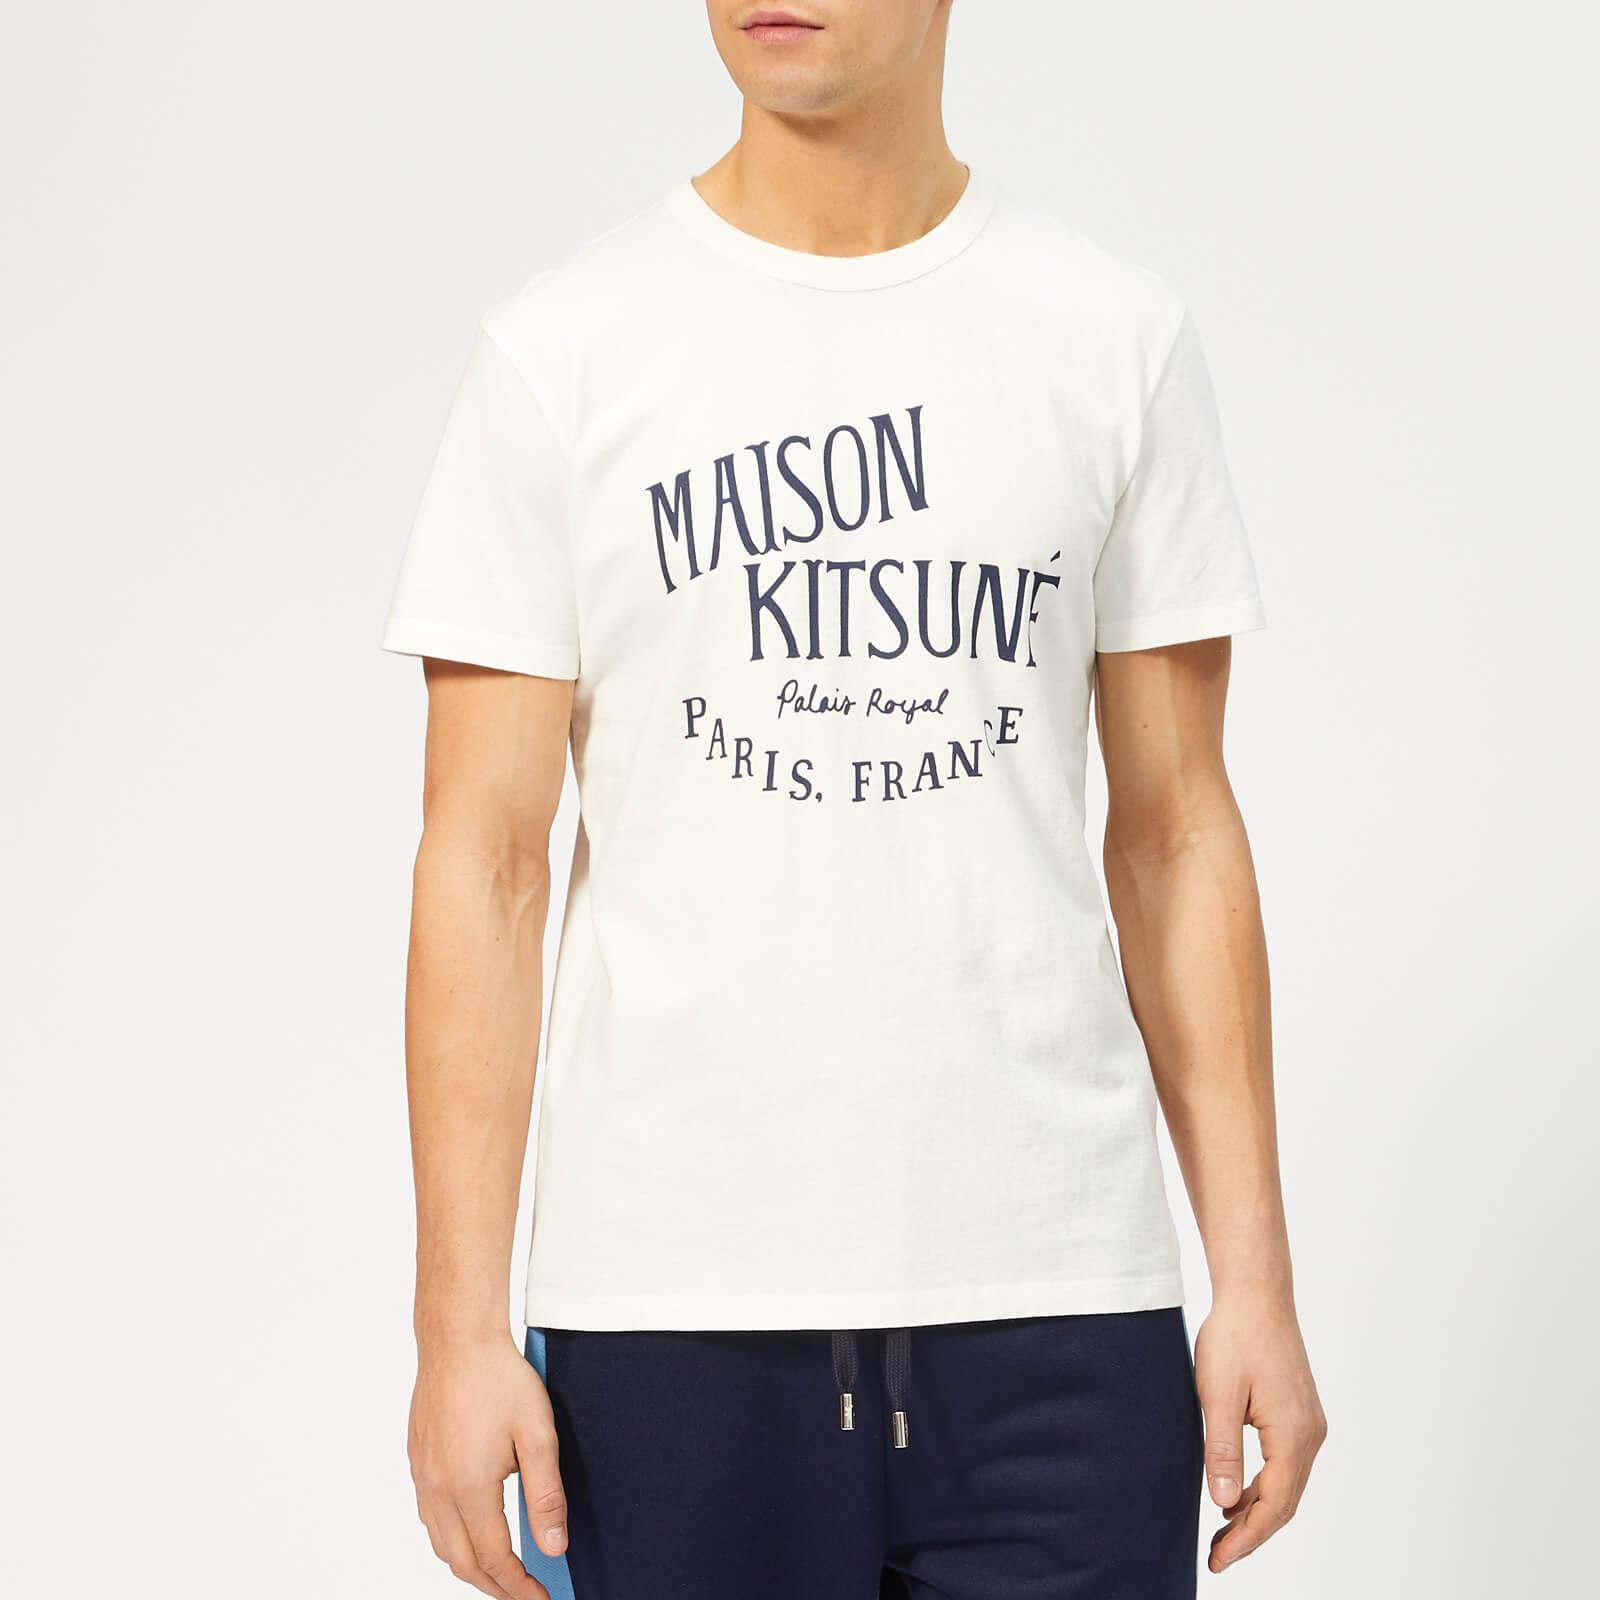 b204df860030 Maison Kitsuné Men s Palais Royal T-Shirt - White - Free UK Delivery over £ 50